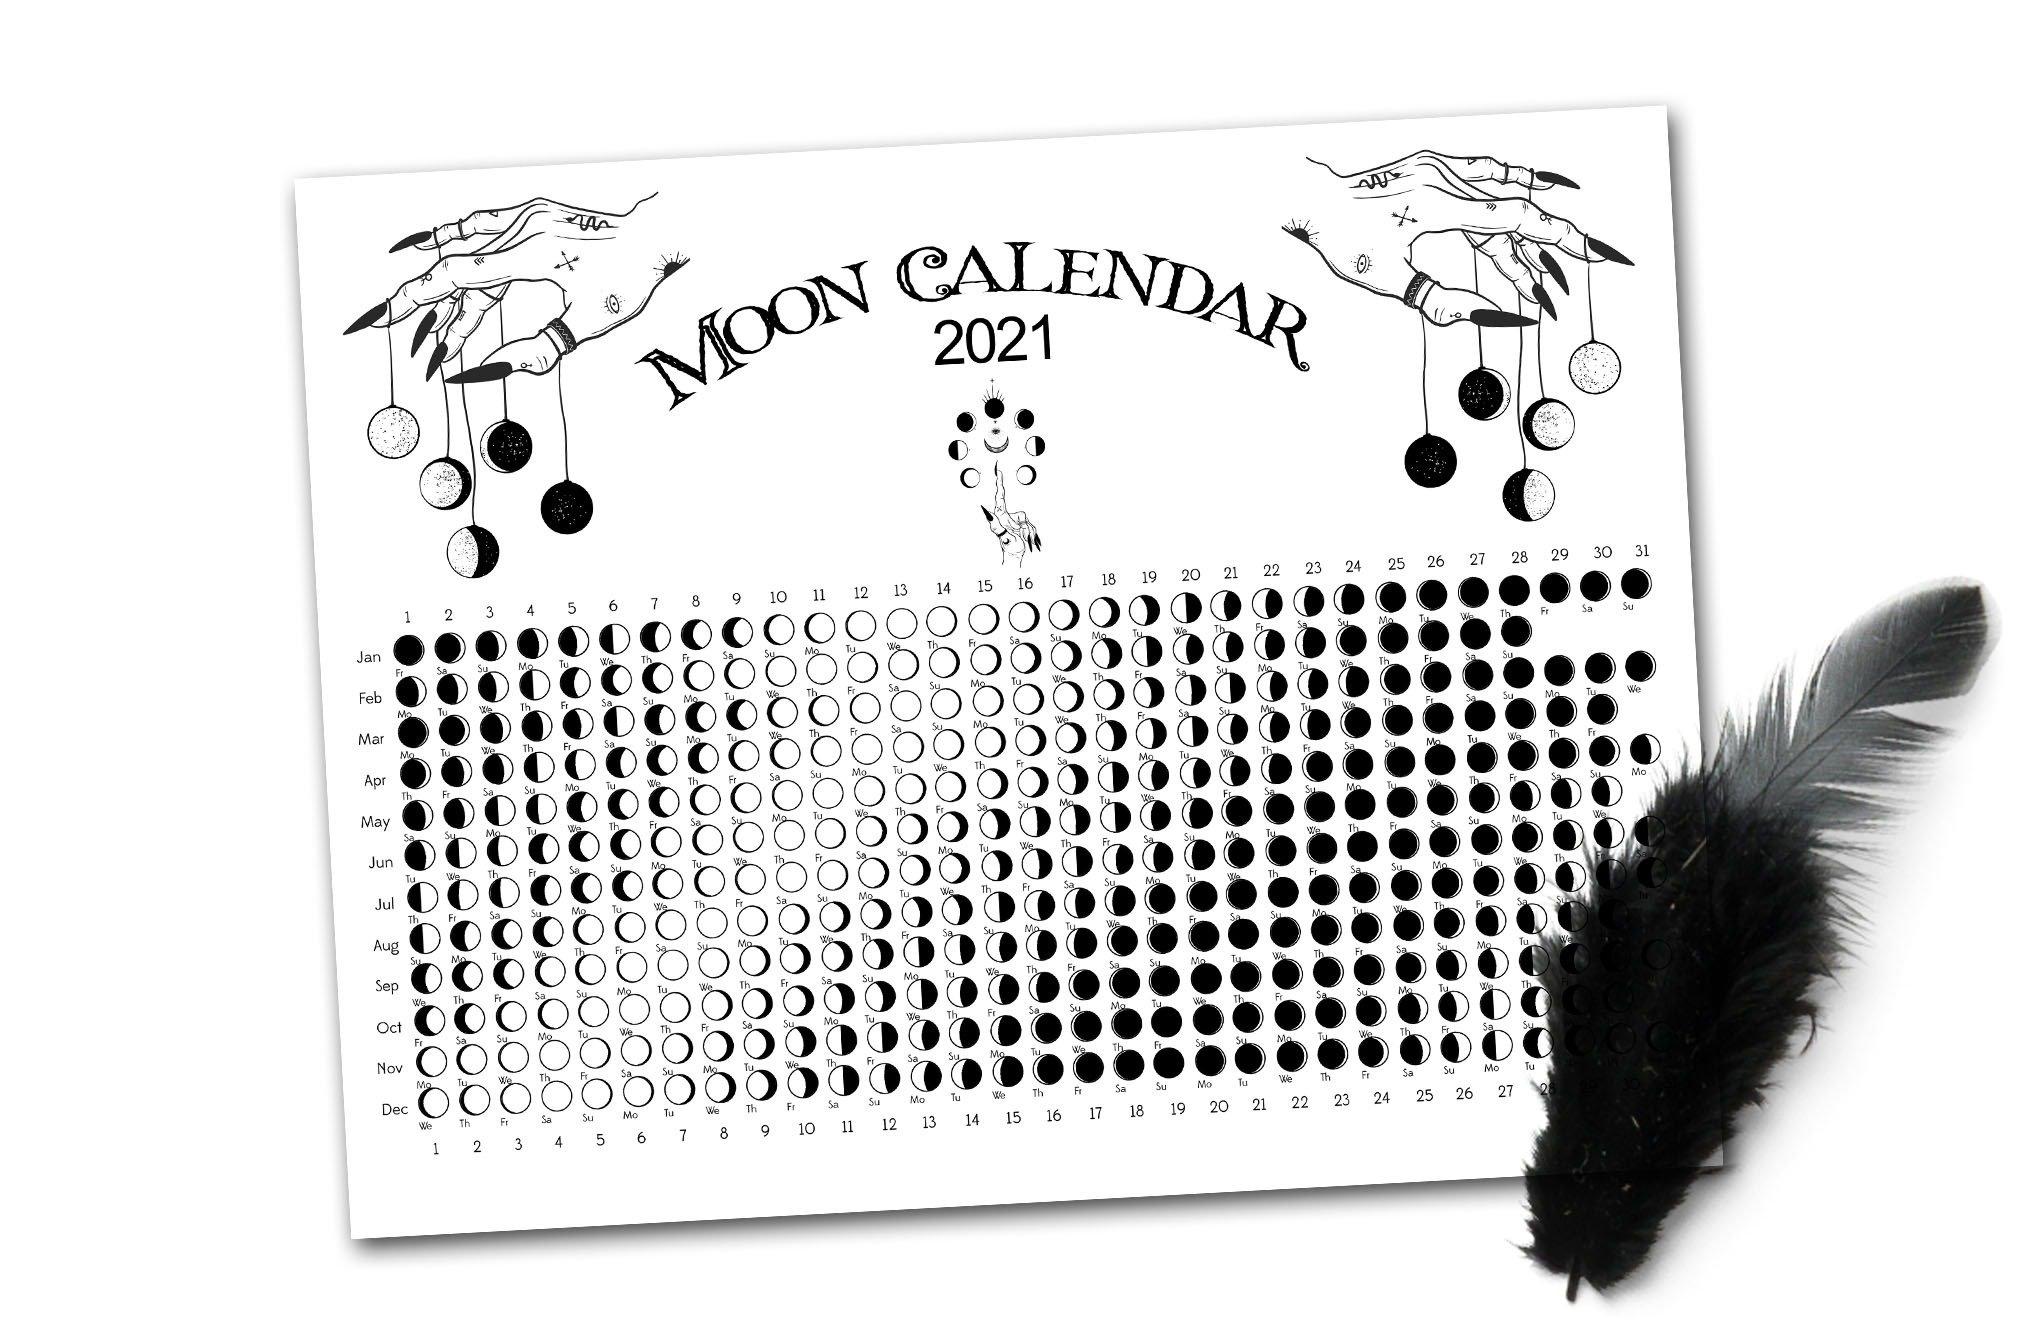 2021 Witch Moon Calendar - Morgana Magick Spell with Lunar Calendar 2021 Picture Healer Image